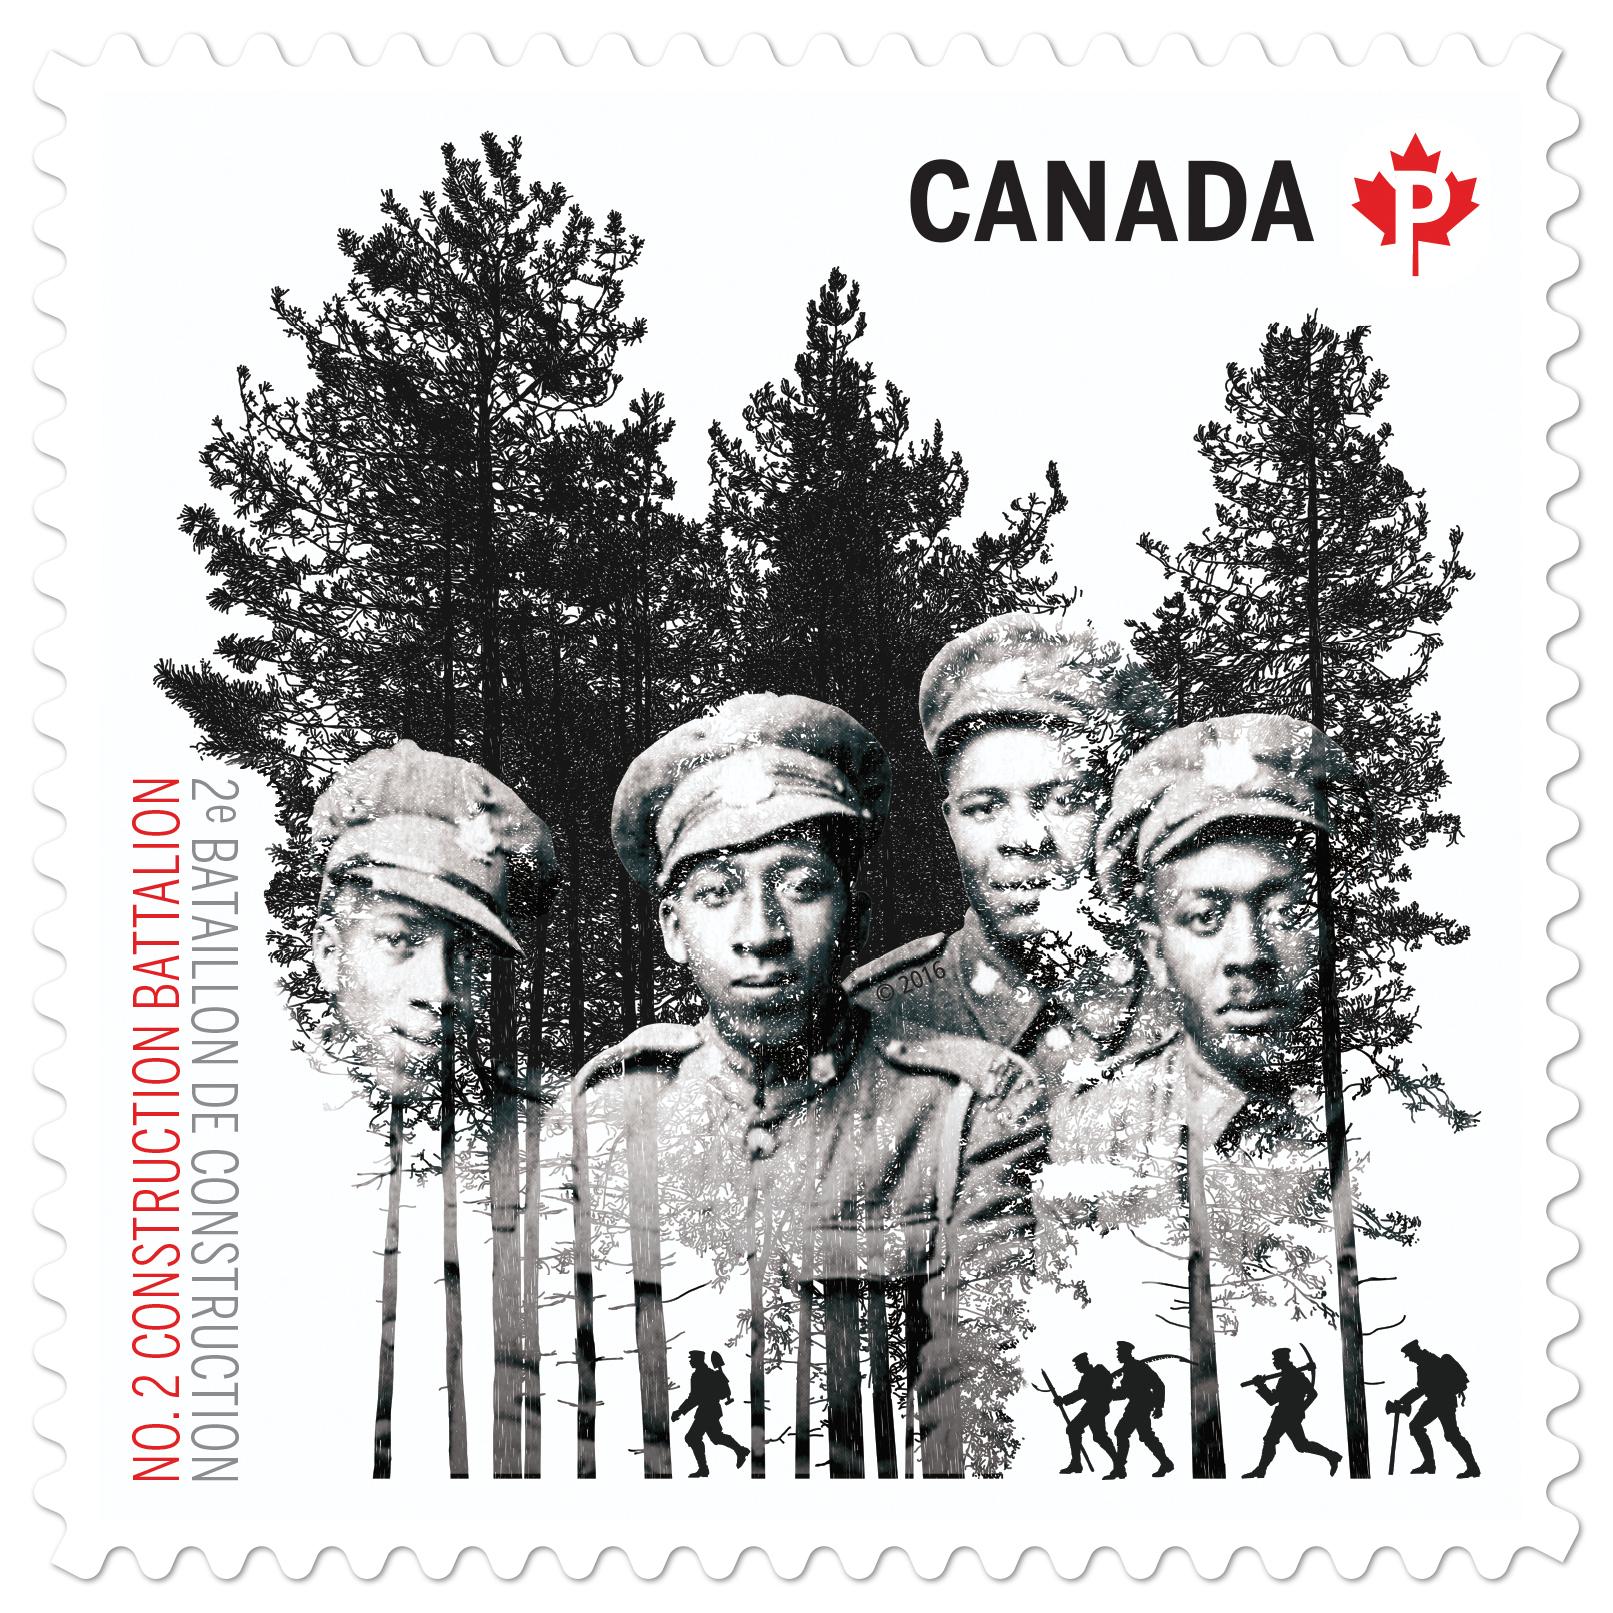 New stamp honours black Canadian First World War battalion